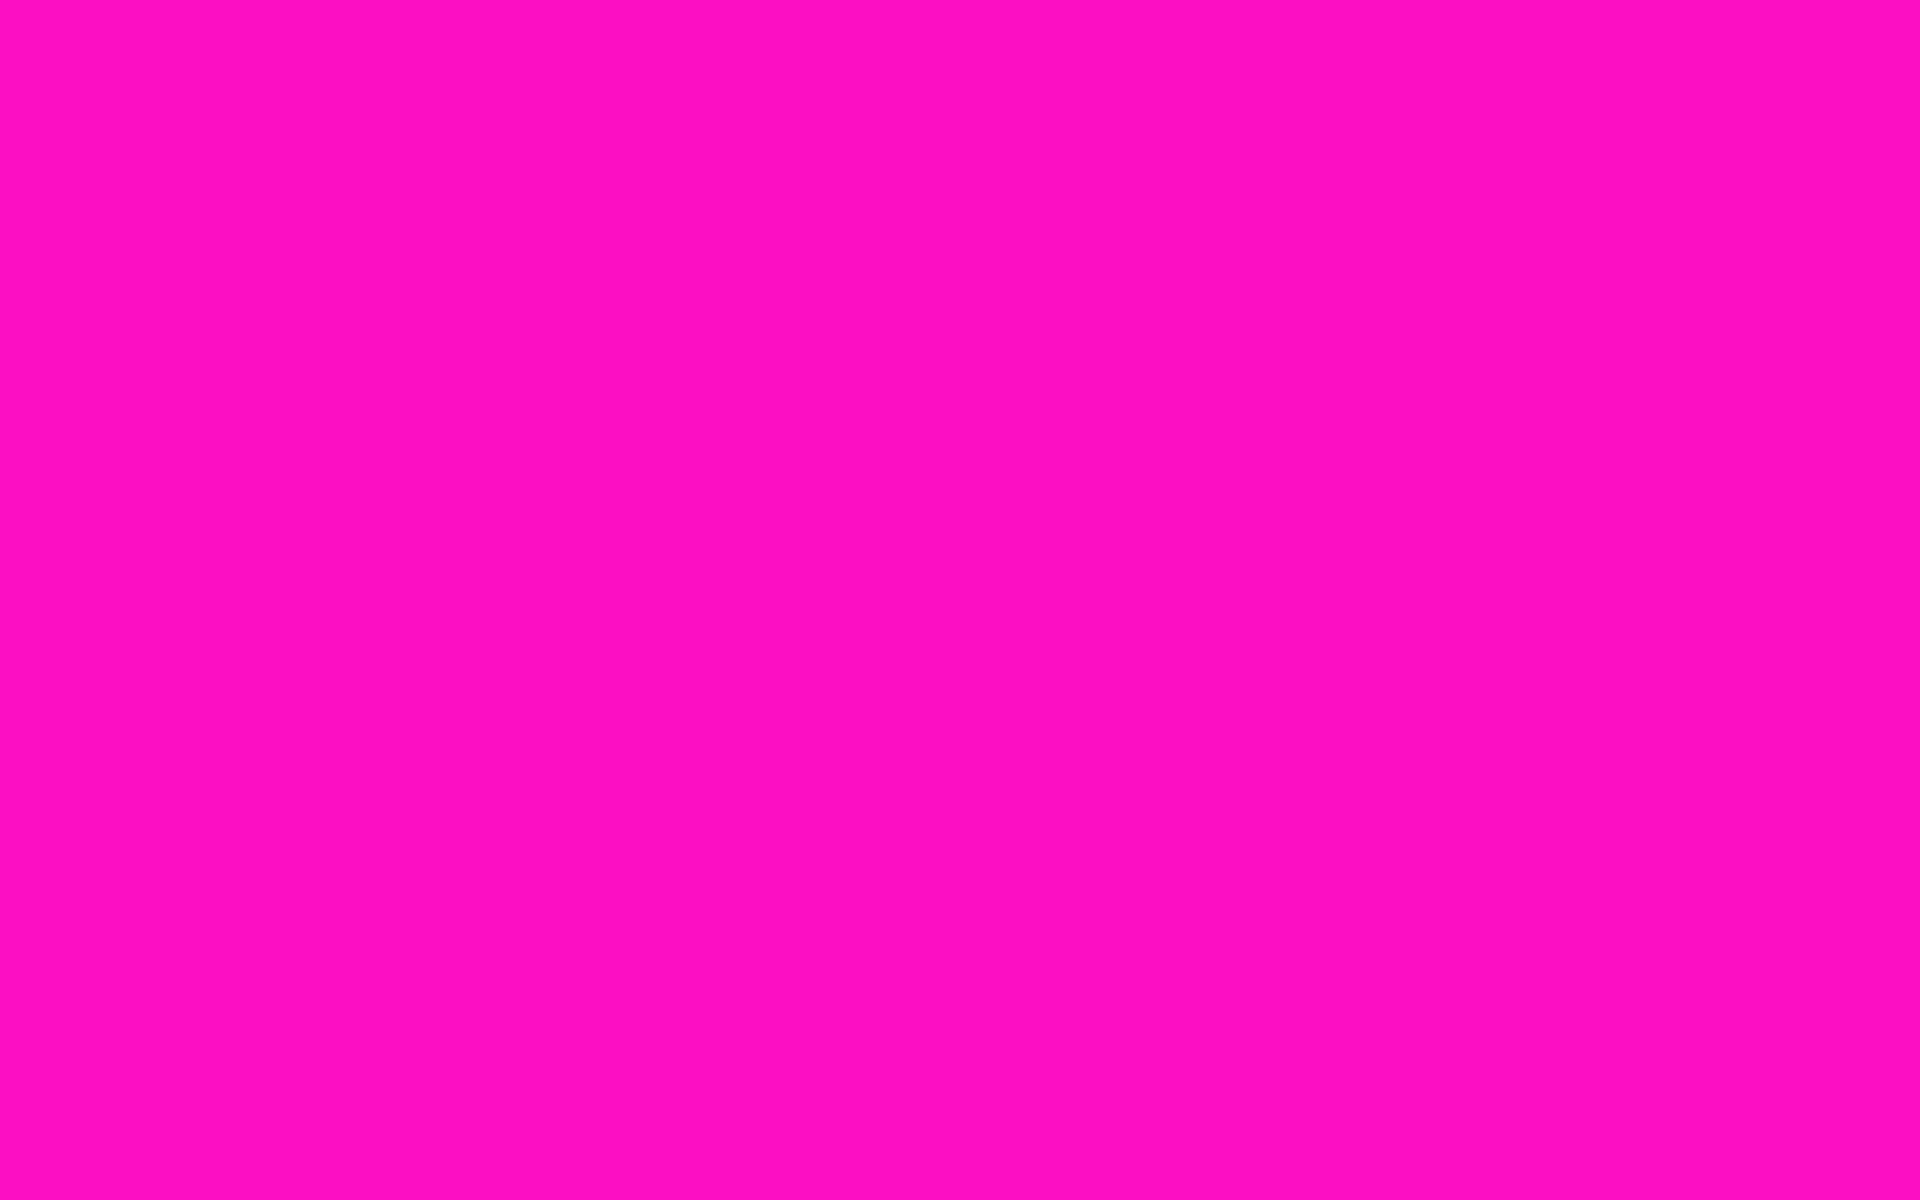 1920x1200 Shocking Pink Solid Color Background